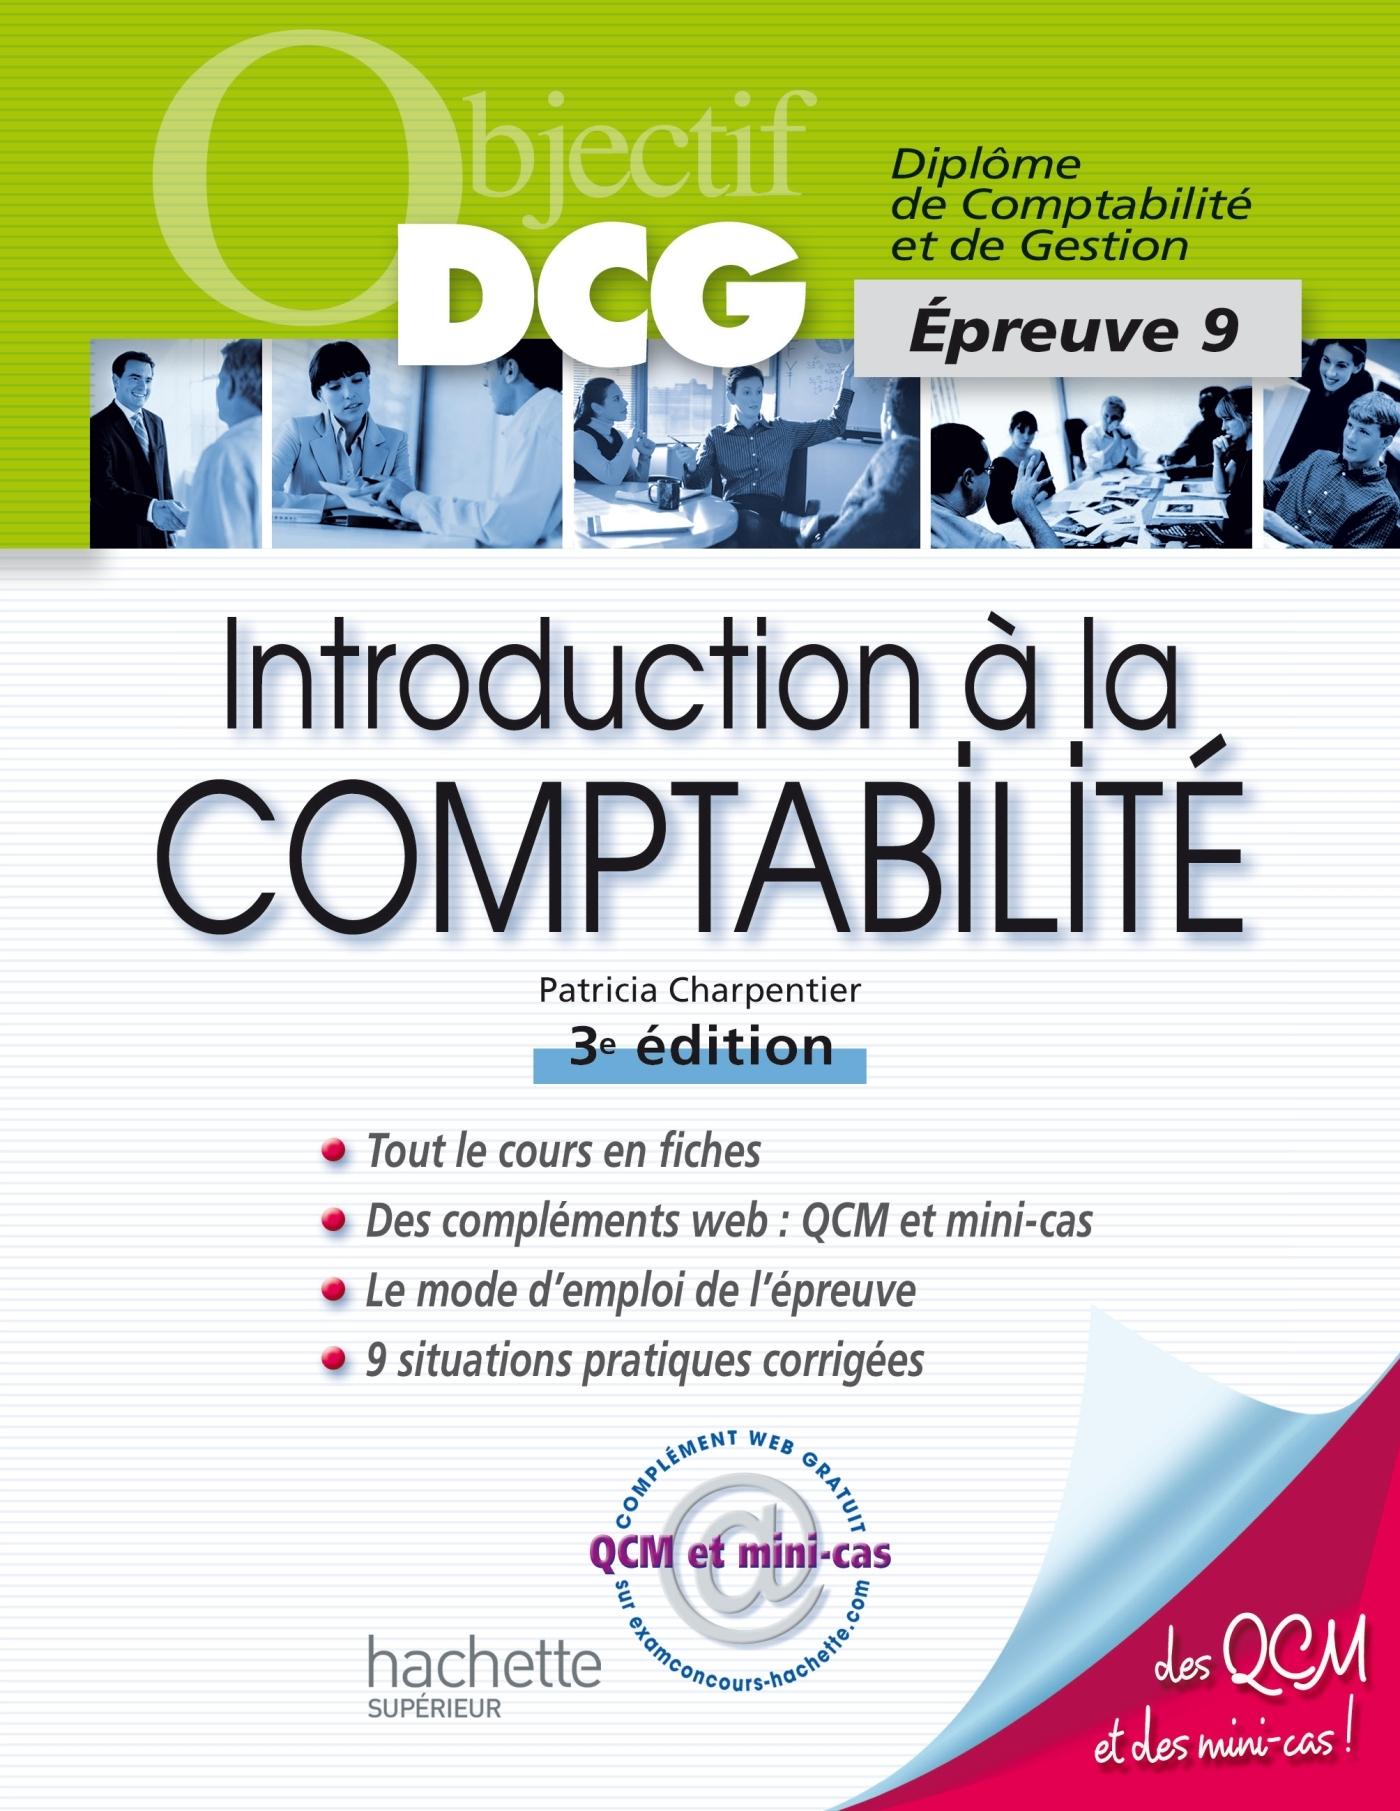 OBJECTIF DCG - INTRODUCTION A LA COMPTABILITE